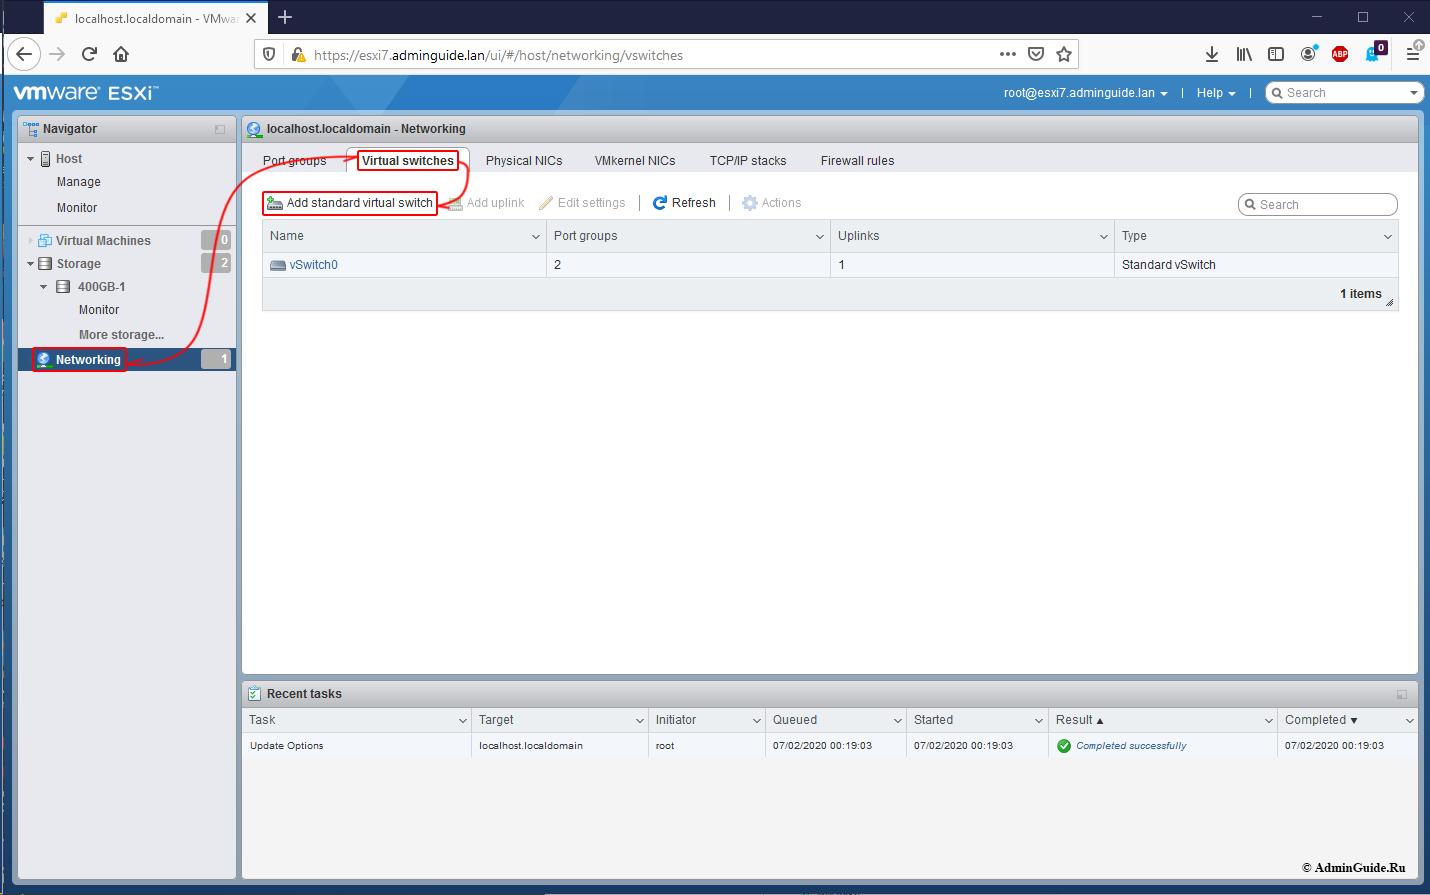 Установка Untangle NG Firewall и первичная настройка на ESXi 7 - Добавление второго vSwitch